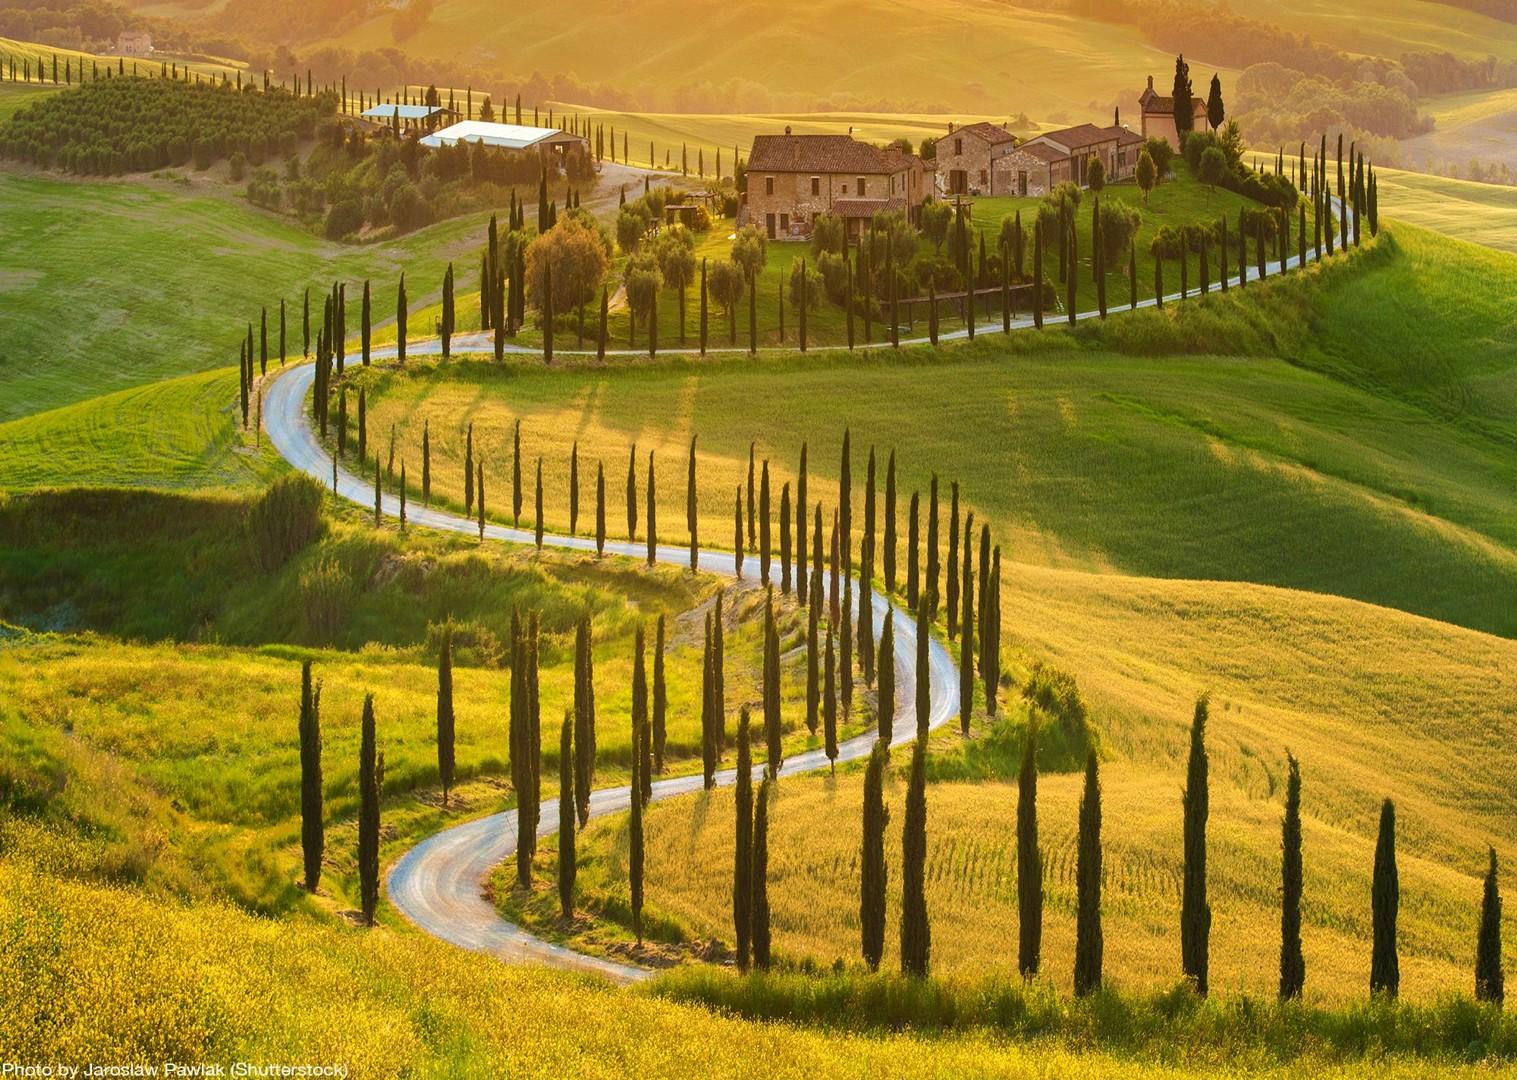 cypress-snakes-tuscany-leisure-bike-tour-self-guided.jpg - Italy - Classic Tuscany - Self-Guided Leisure Cycling Holiday - Leisure Cycling